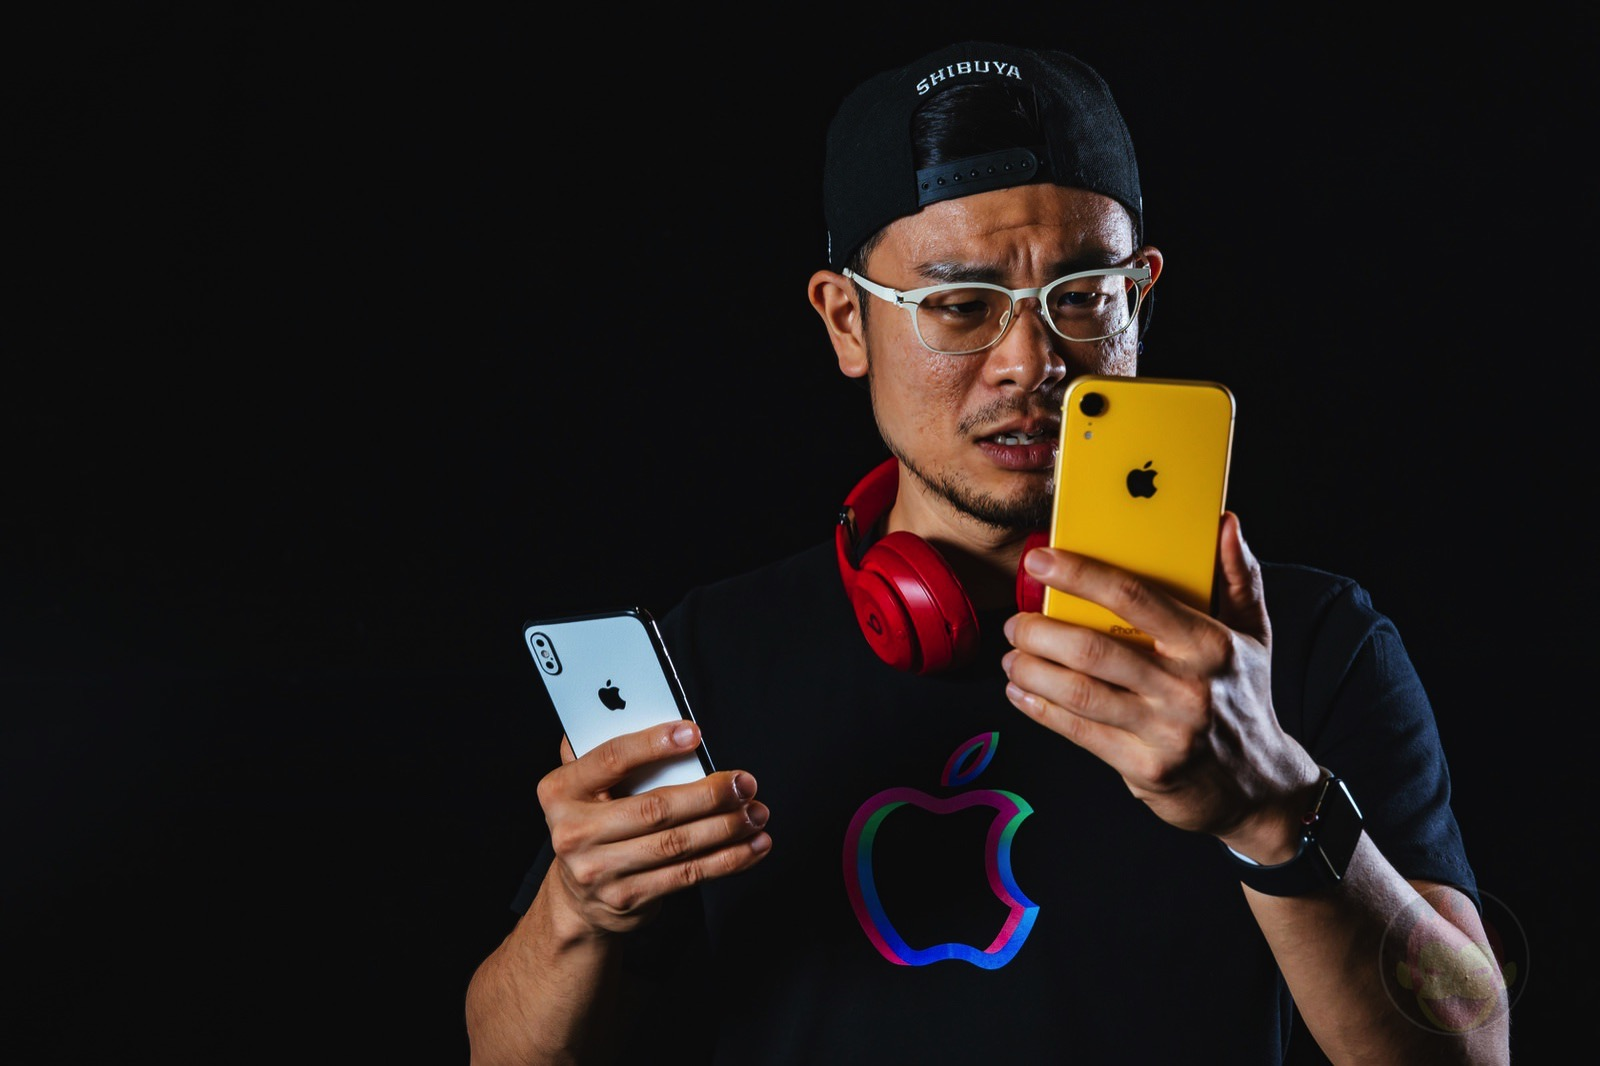 Holding-iPhoneXS-and-iPhoneXR-01.jpg